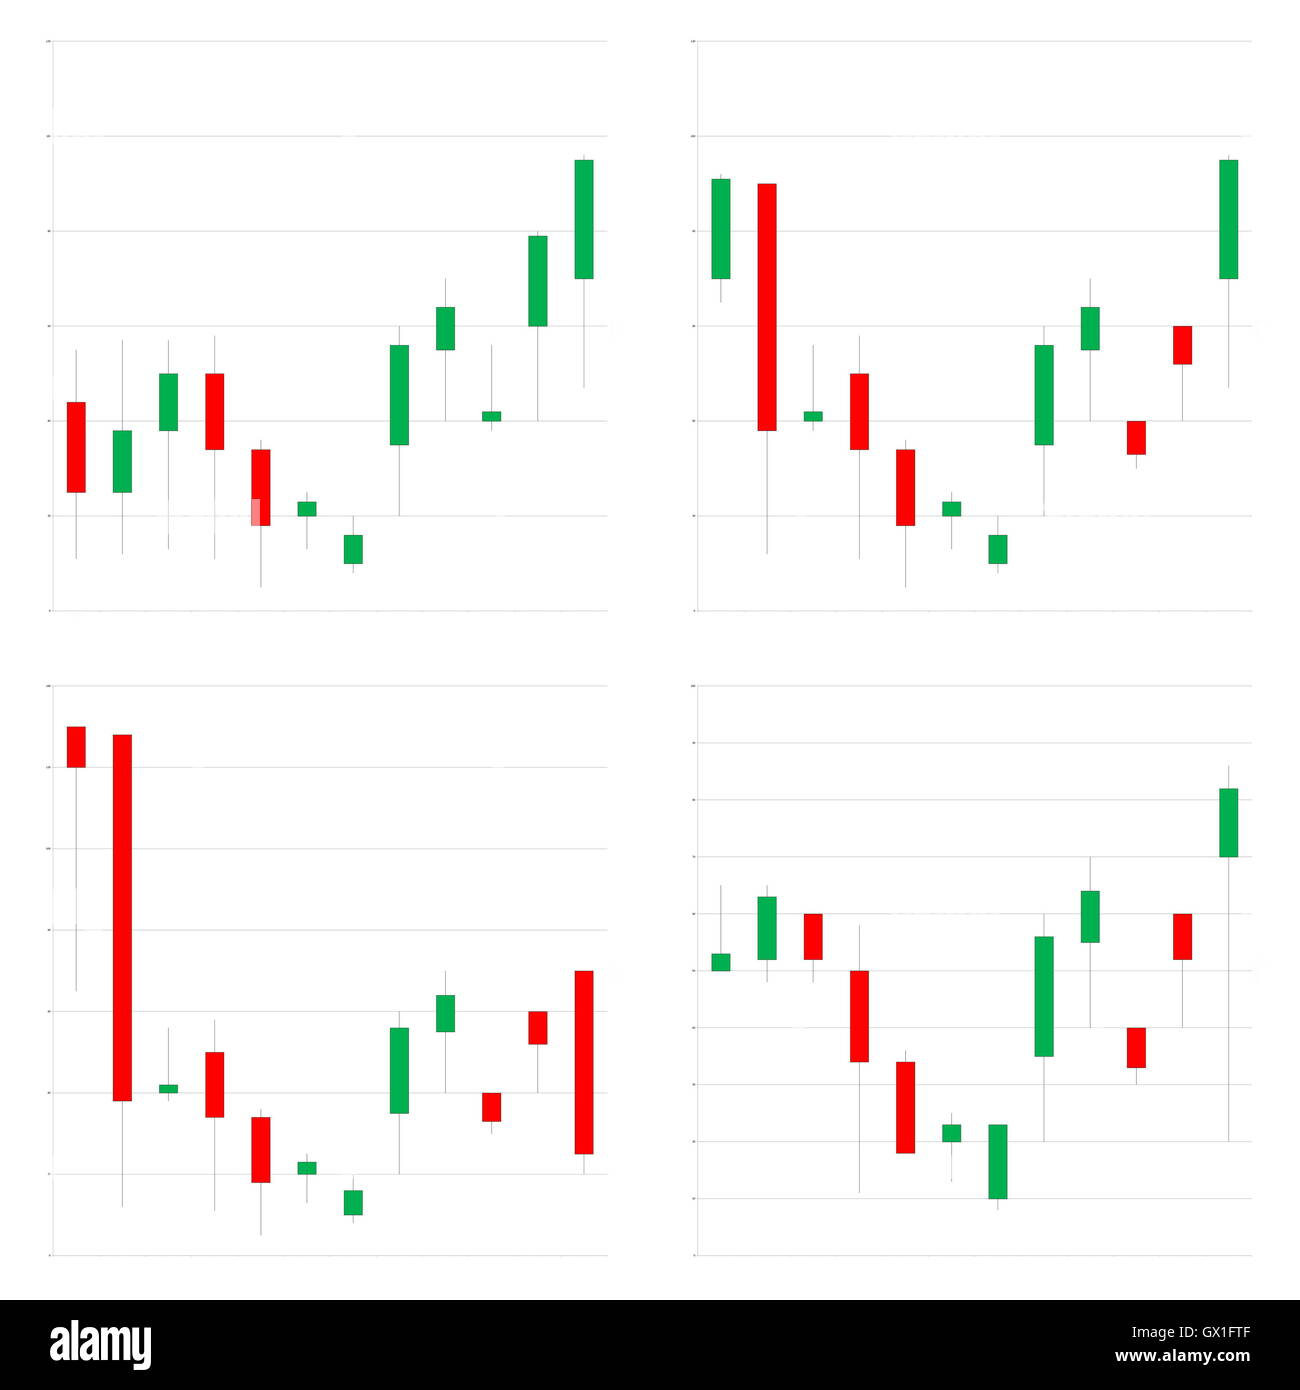 Candice japanese candlesticks index